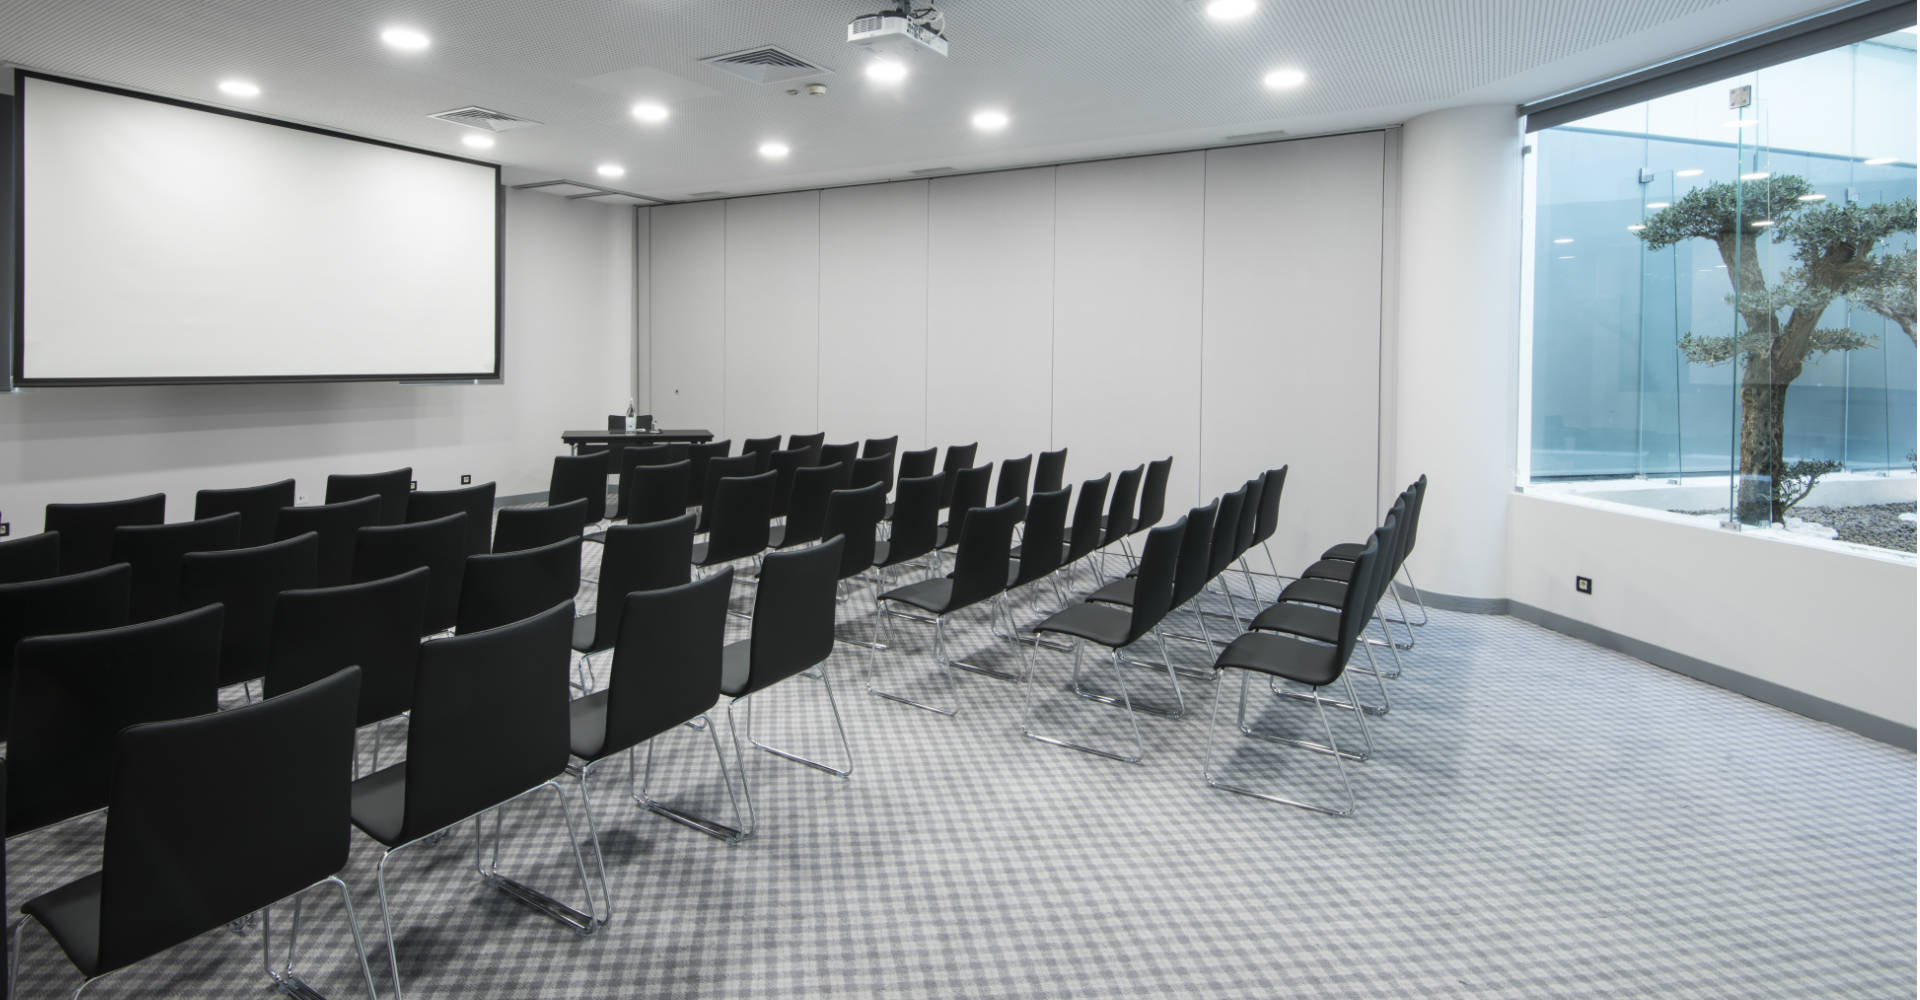 Meetings Rooms in Lisbon | Tivoli Oriente Lisboa Hotel